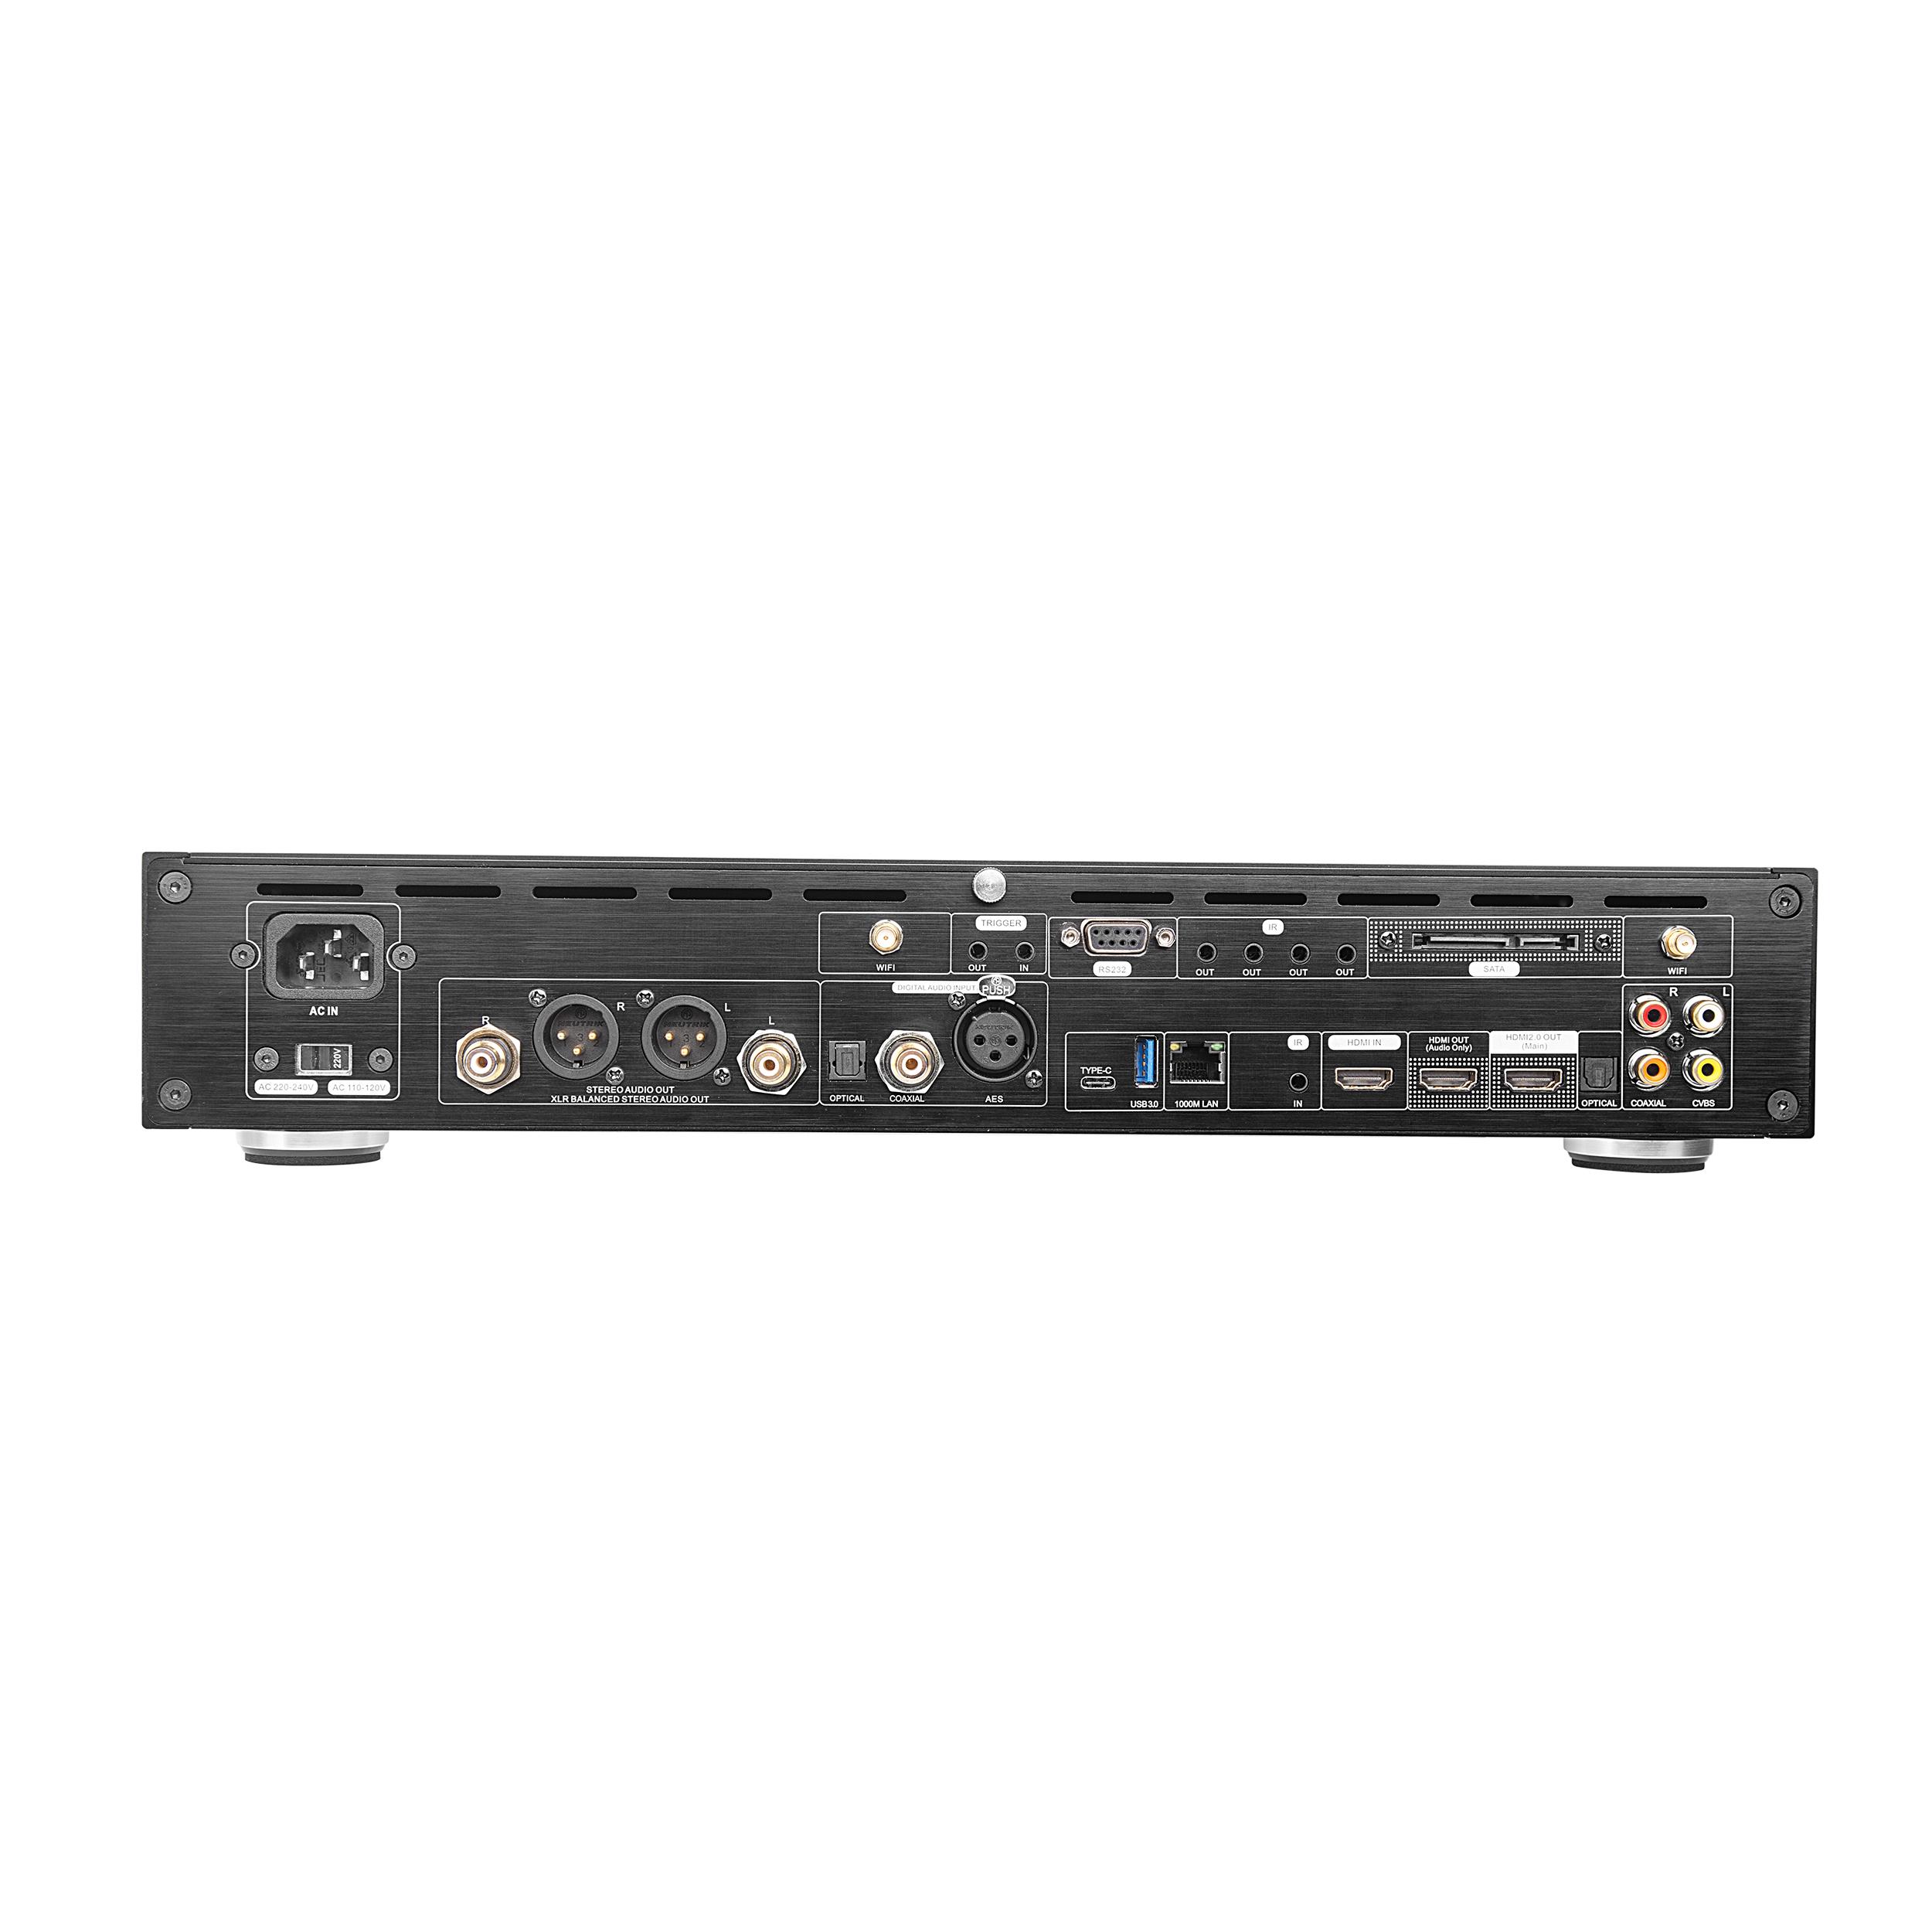 R11 3D 4K Blu-Ray Ultra Hd Audiophile Media Player+Dsd Hifi Music Player+Dac Decoder+Streaming Server+Nas Server